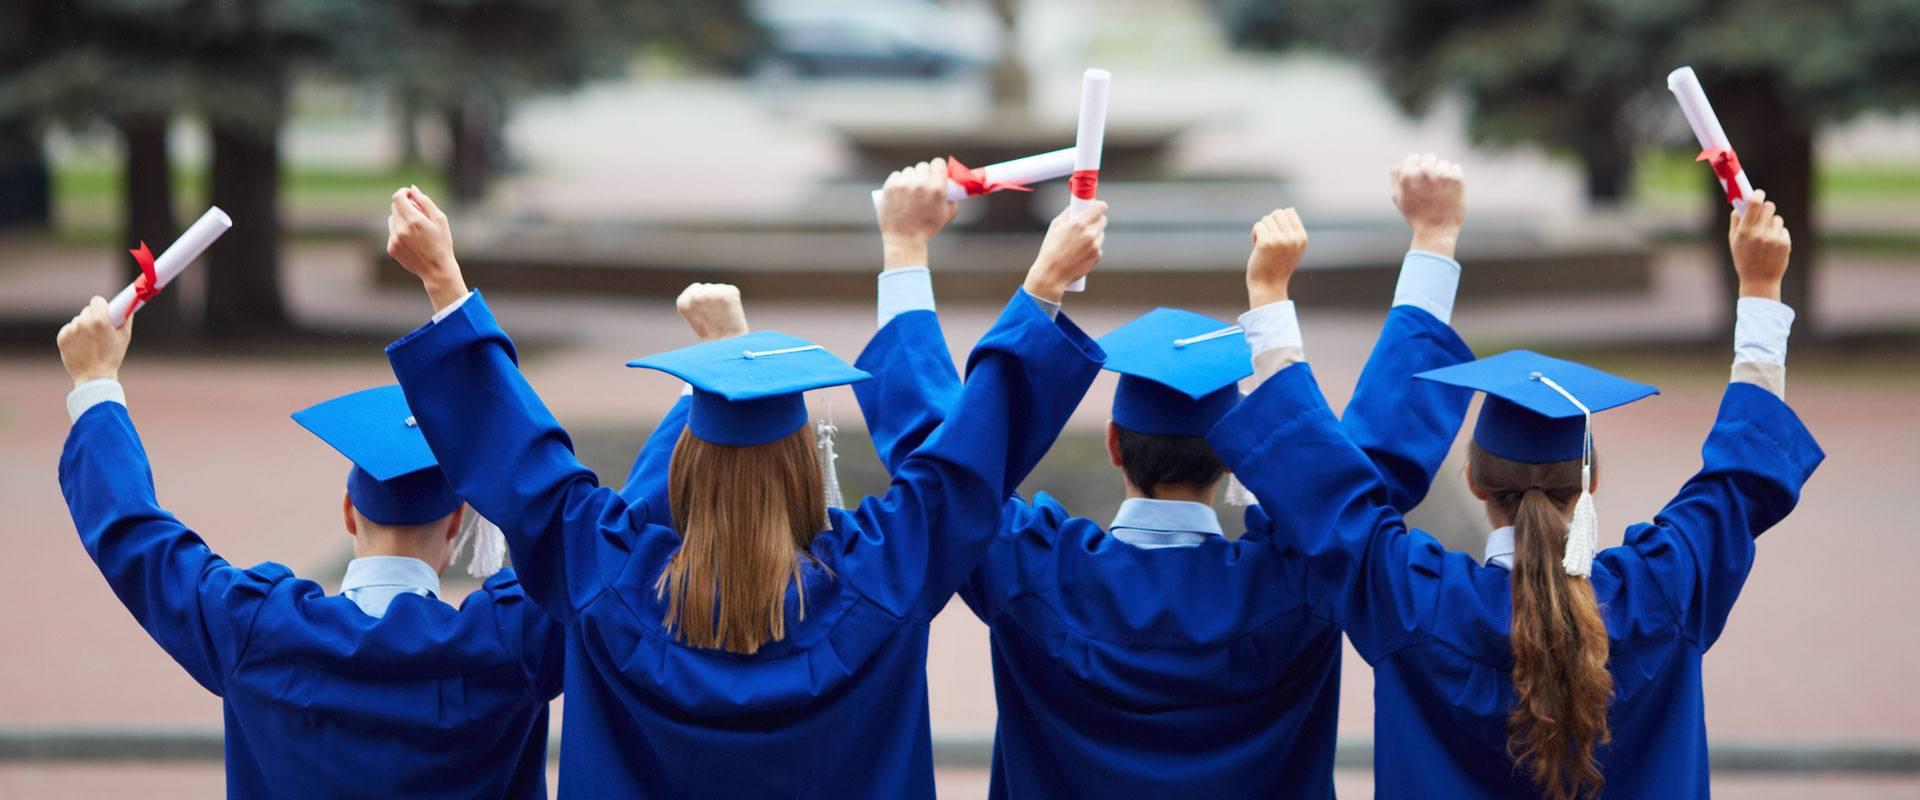 360-degree-education